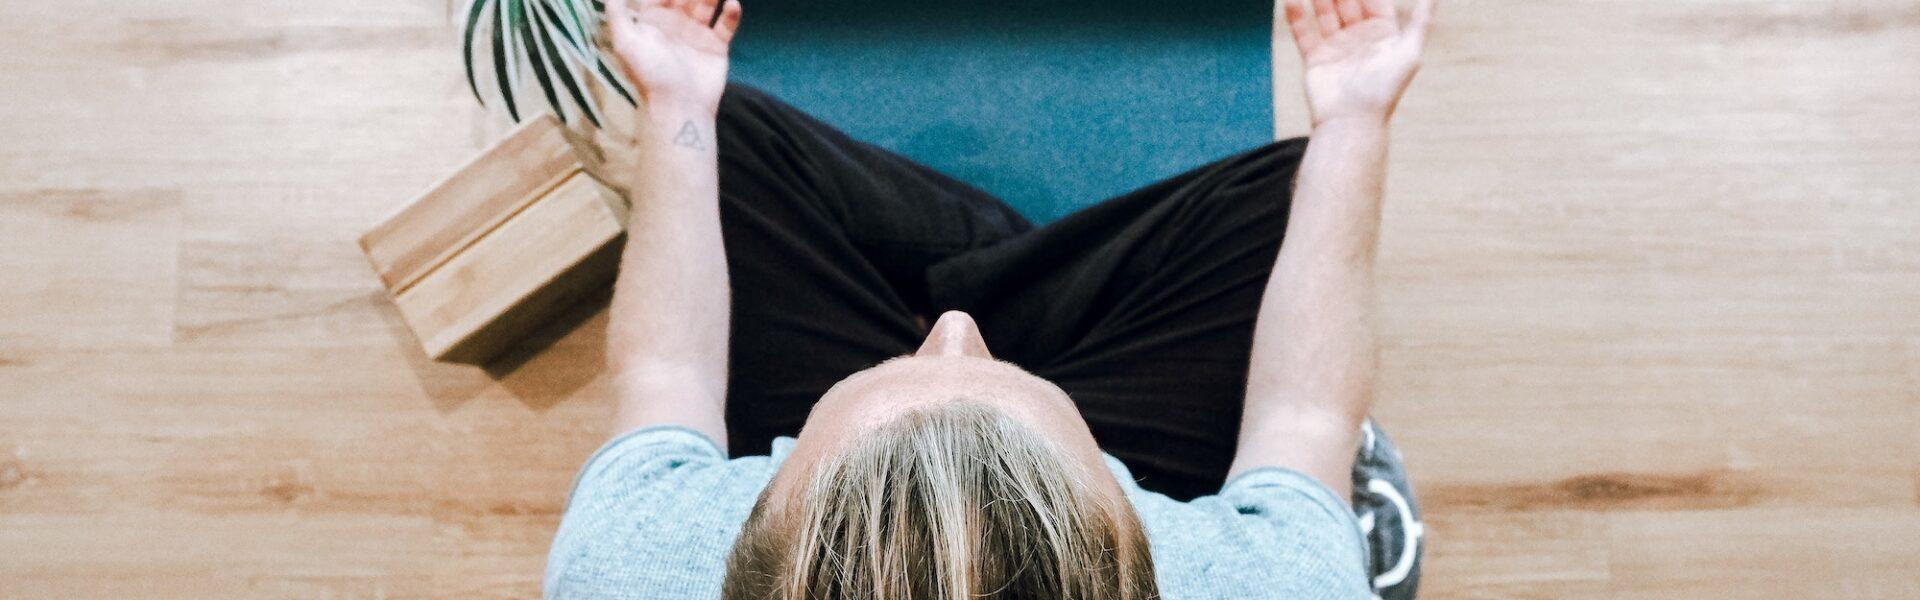 What is Dualism? | Elle Blonde Luxury Lifestyle Destination Blog